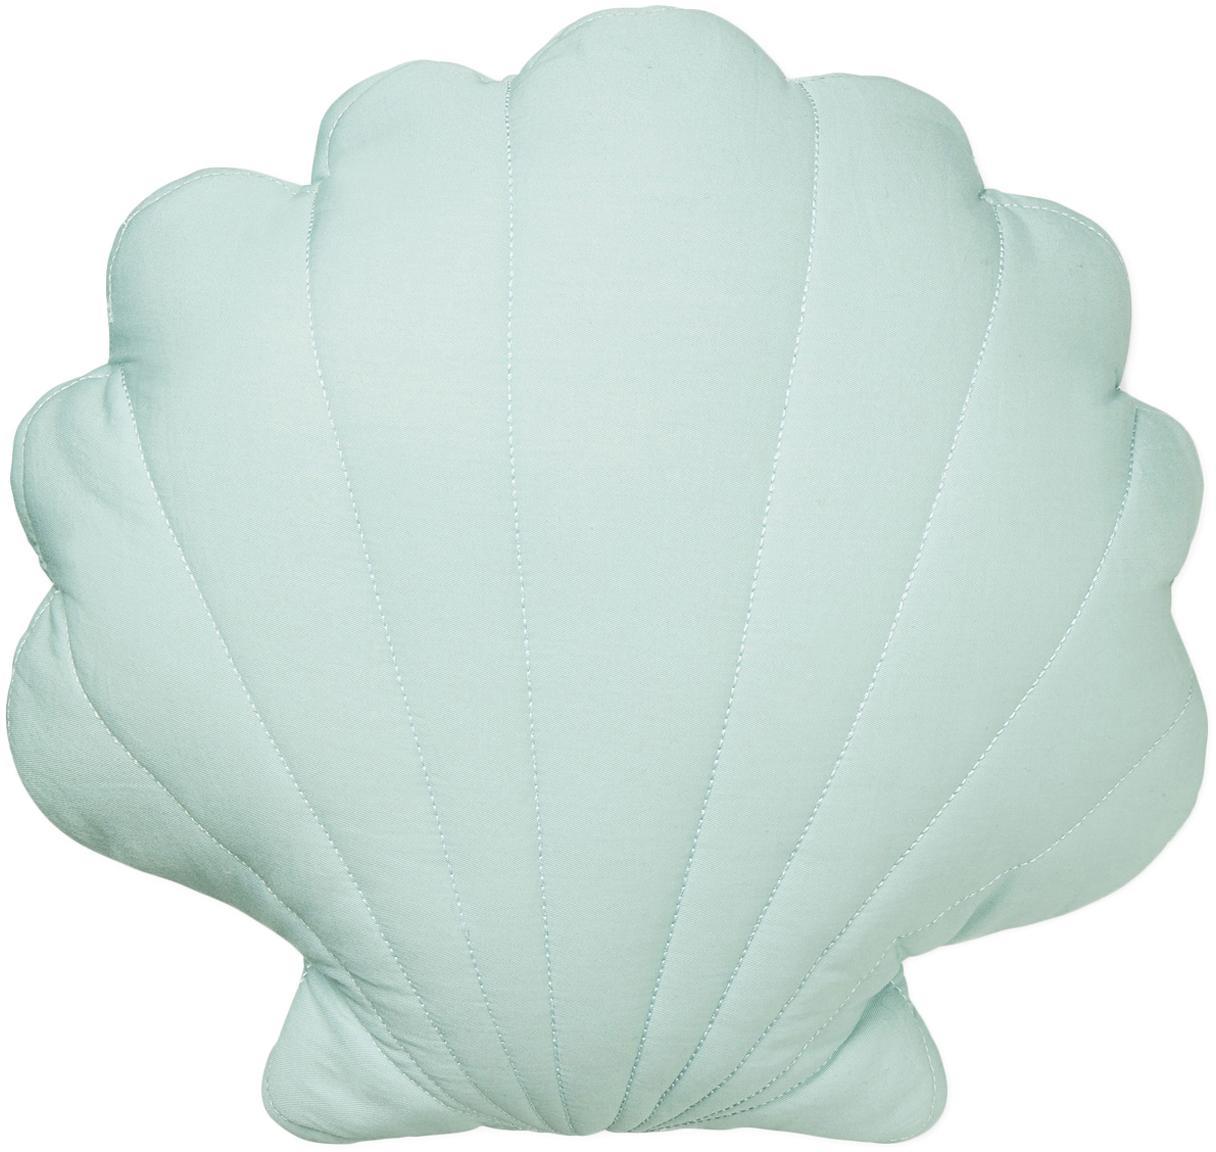 Kussen Sea Shell, met vulling, Mintgroen, 28 x 39 cm